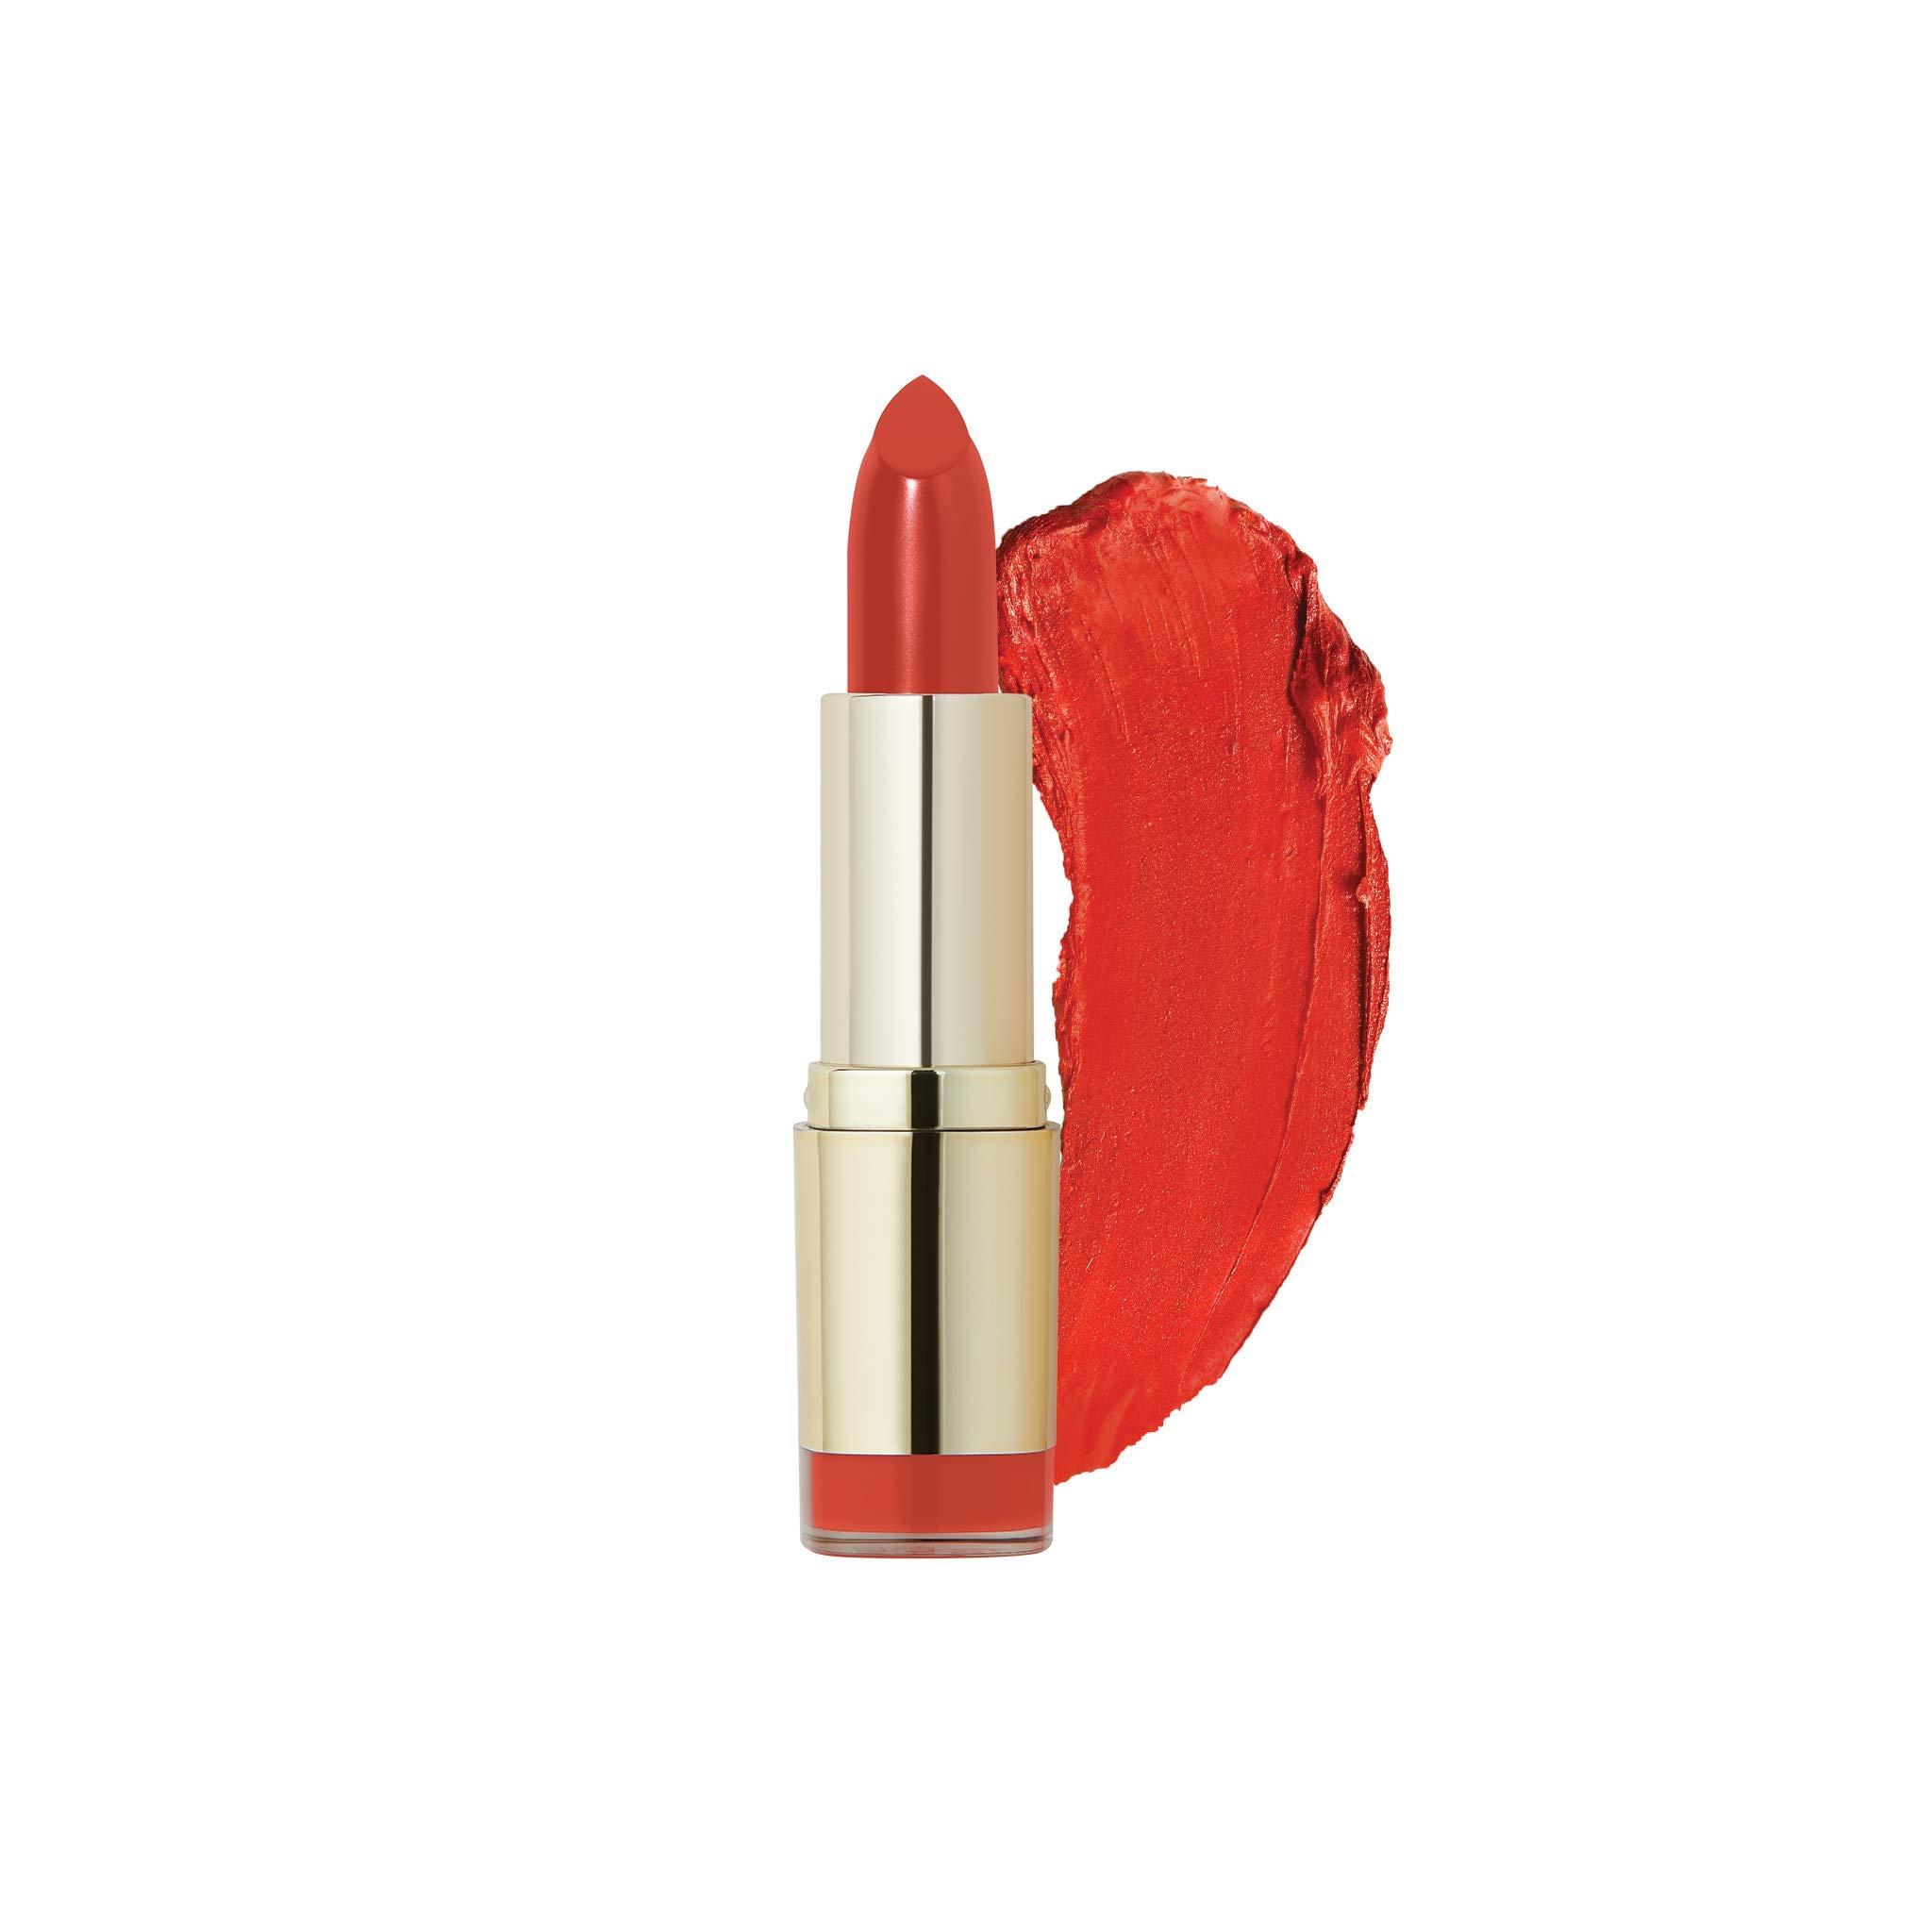 Milani Color Statement Matte Lipstick - Matte Passion (0.14 Ounce) Cruelty-Free Nourishing Lipstick with a Full Matte Finish